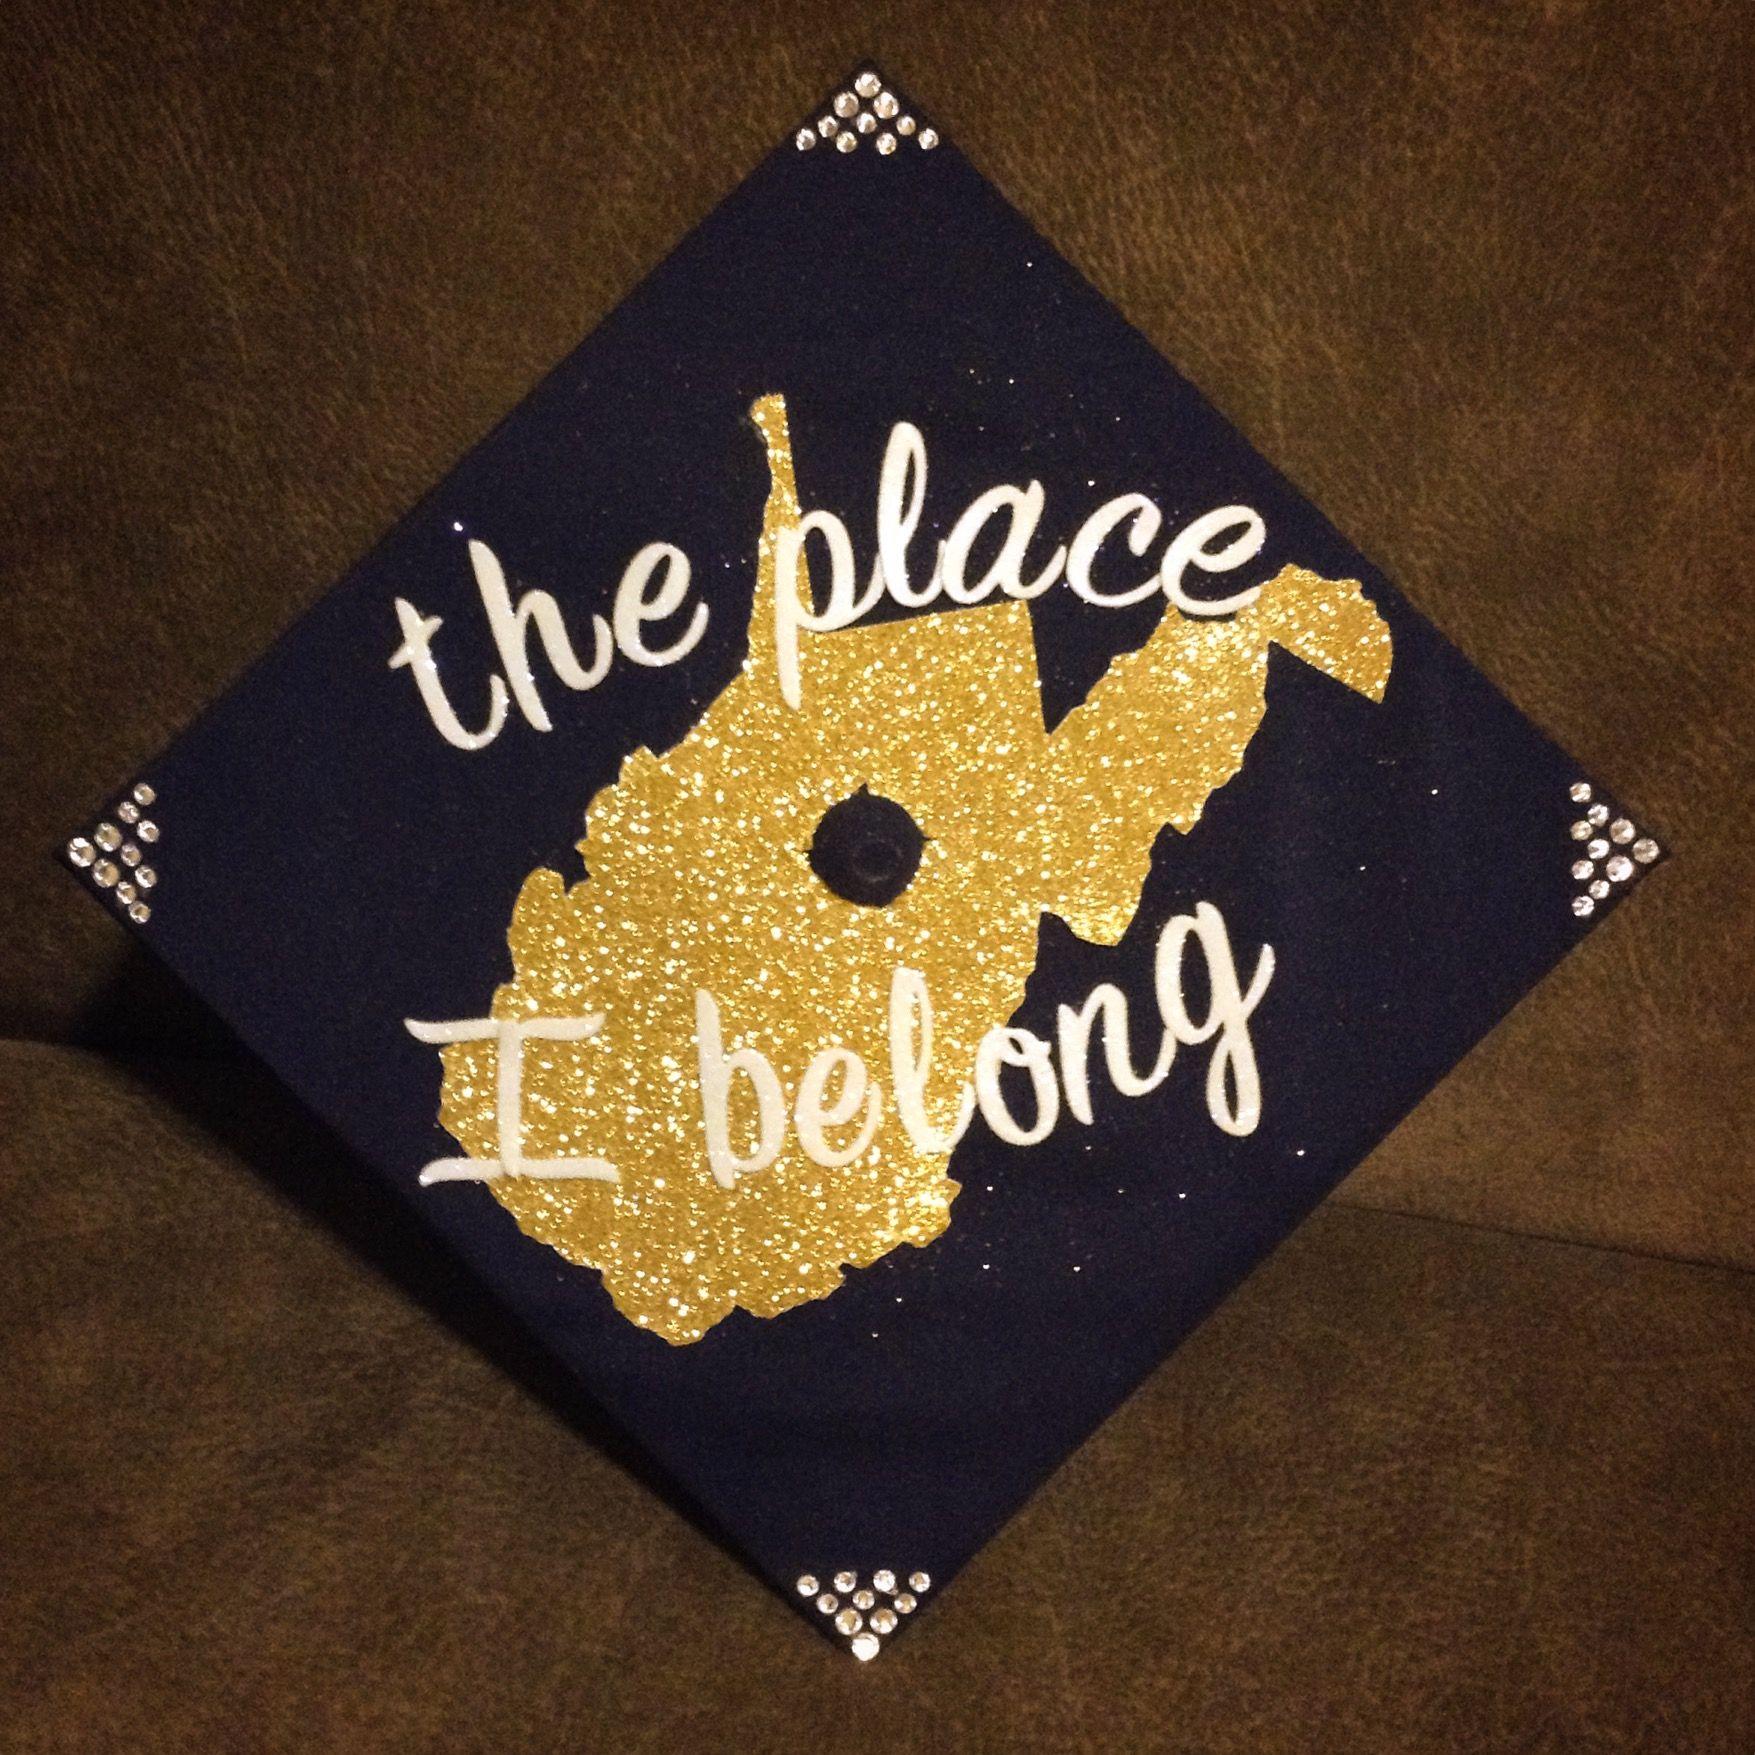 Graduation cap, West Virginia University, 2017 by Sarah R Campbell